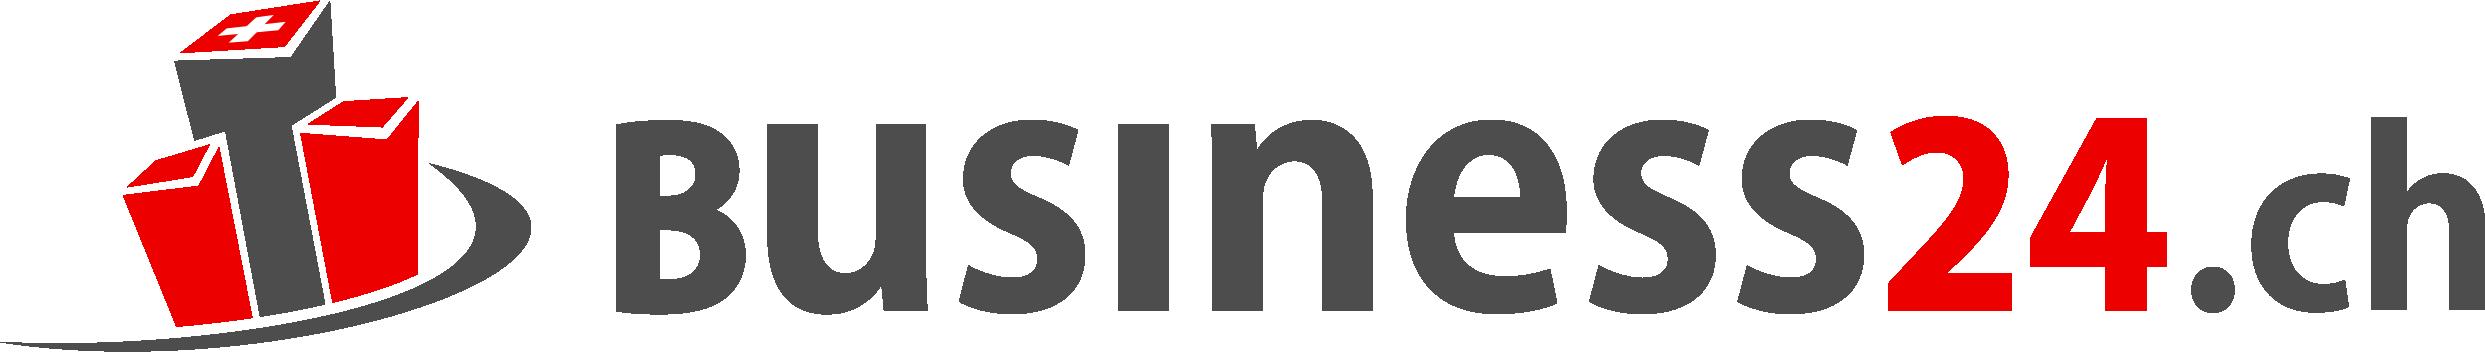 business24.ch_Logo_RGB